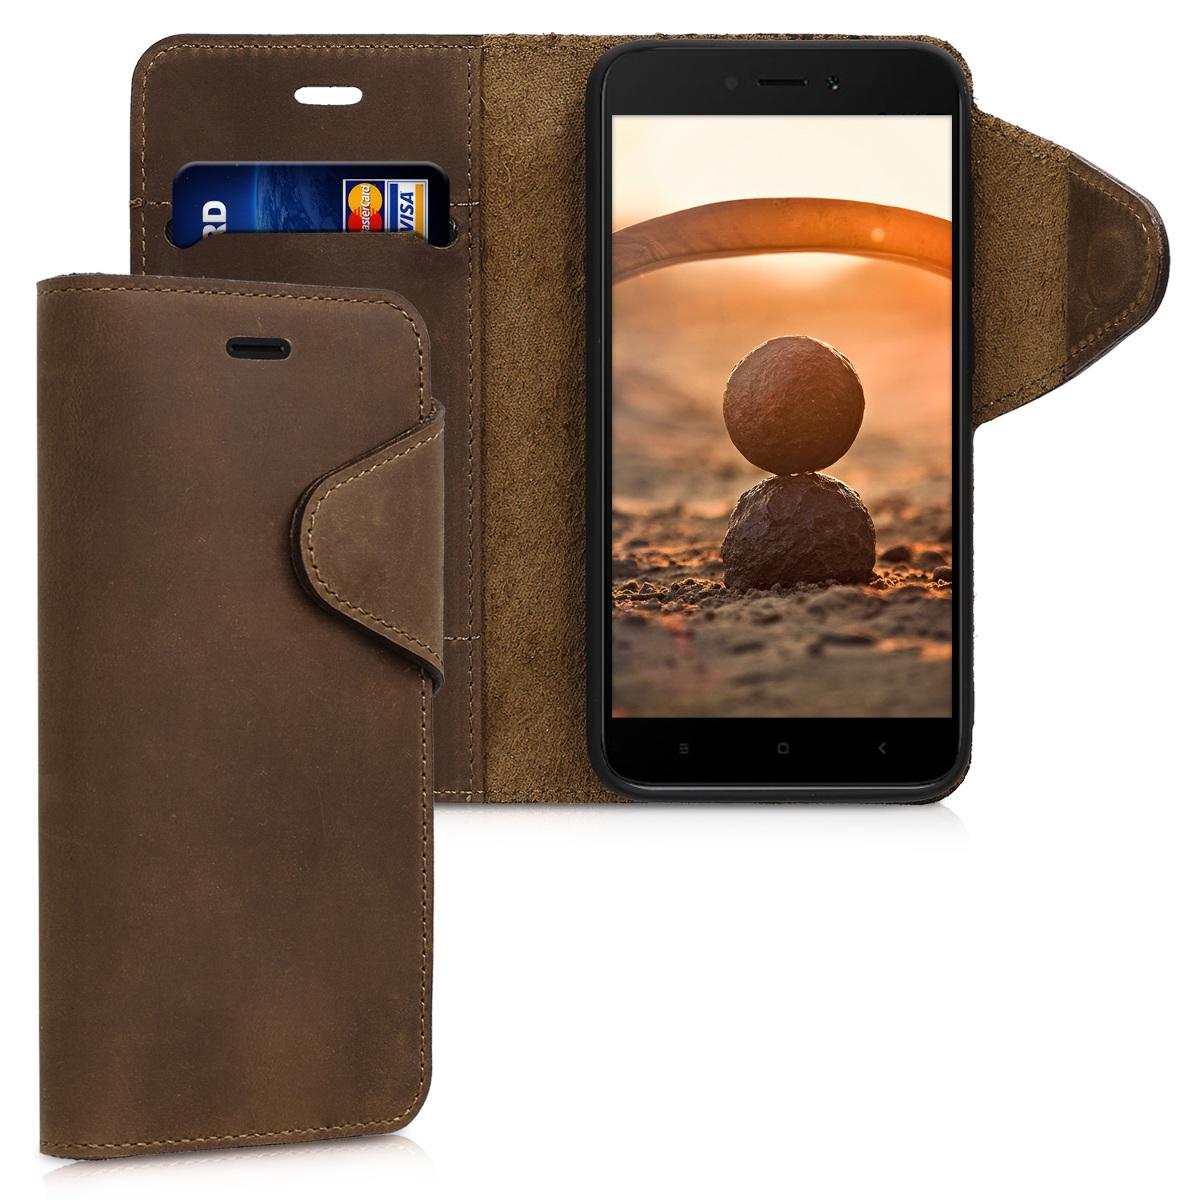 Kalibri Δερμάτινη Suede Θήκη - Πορτοφόλι Xiaomi Redmi 5A -  Brown (45167.05)